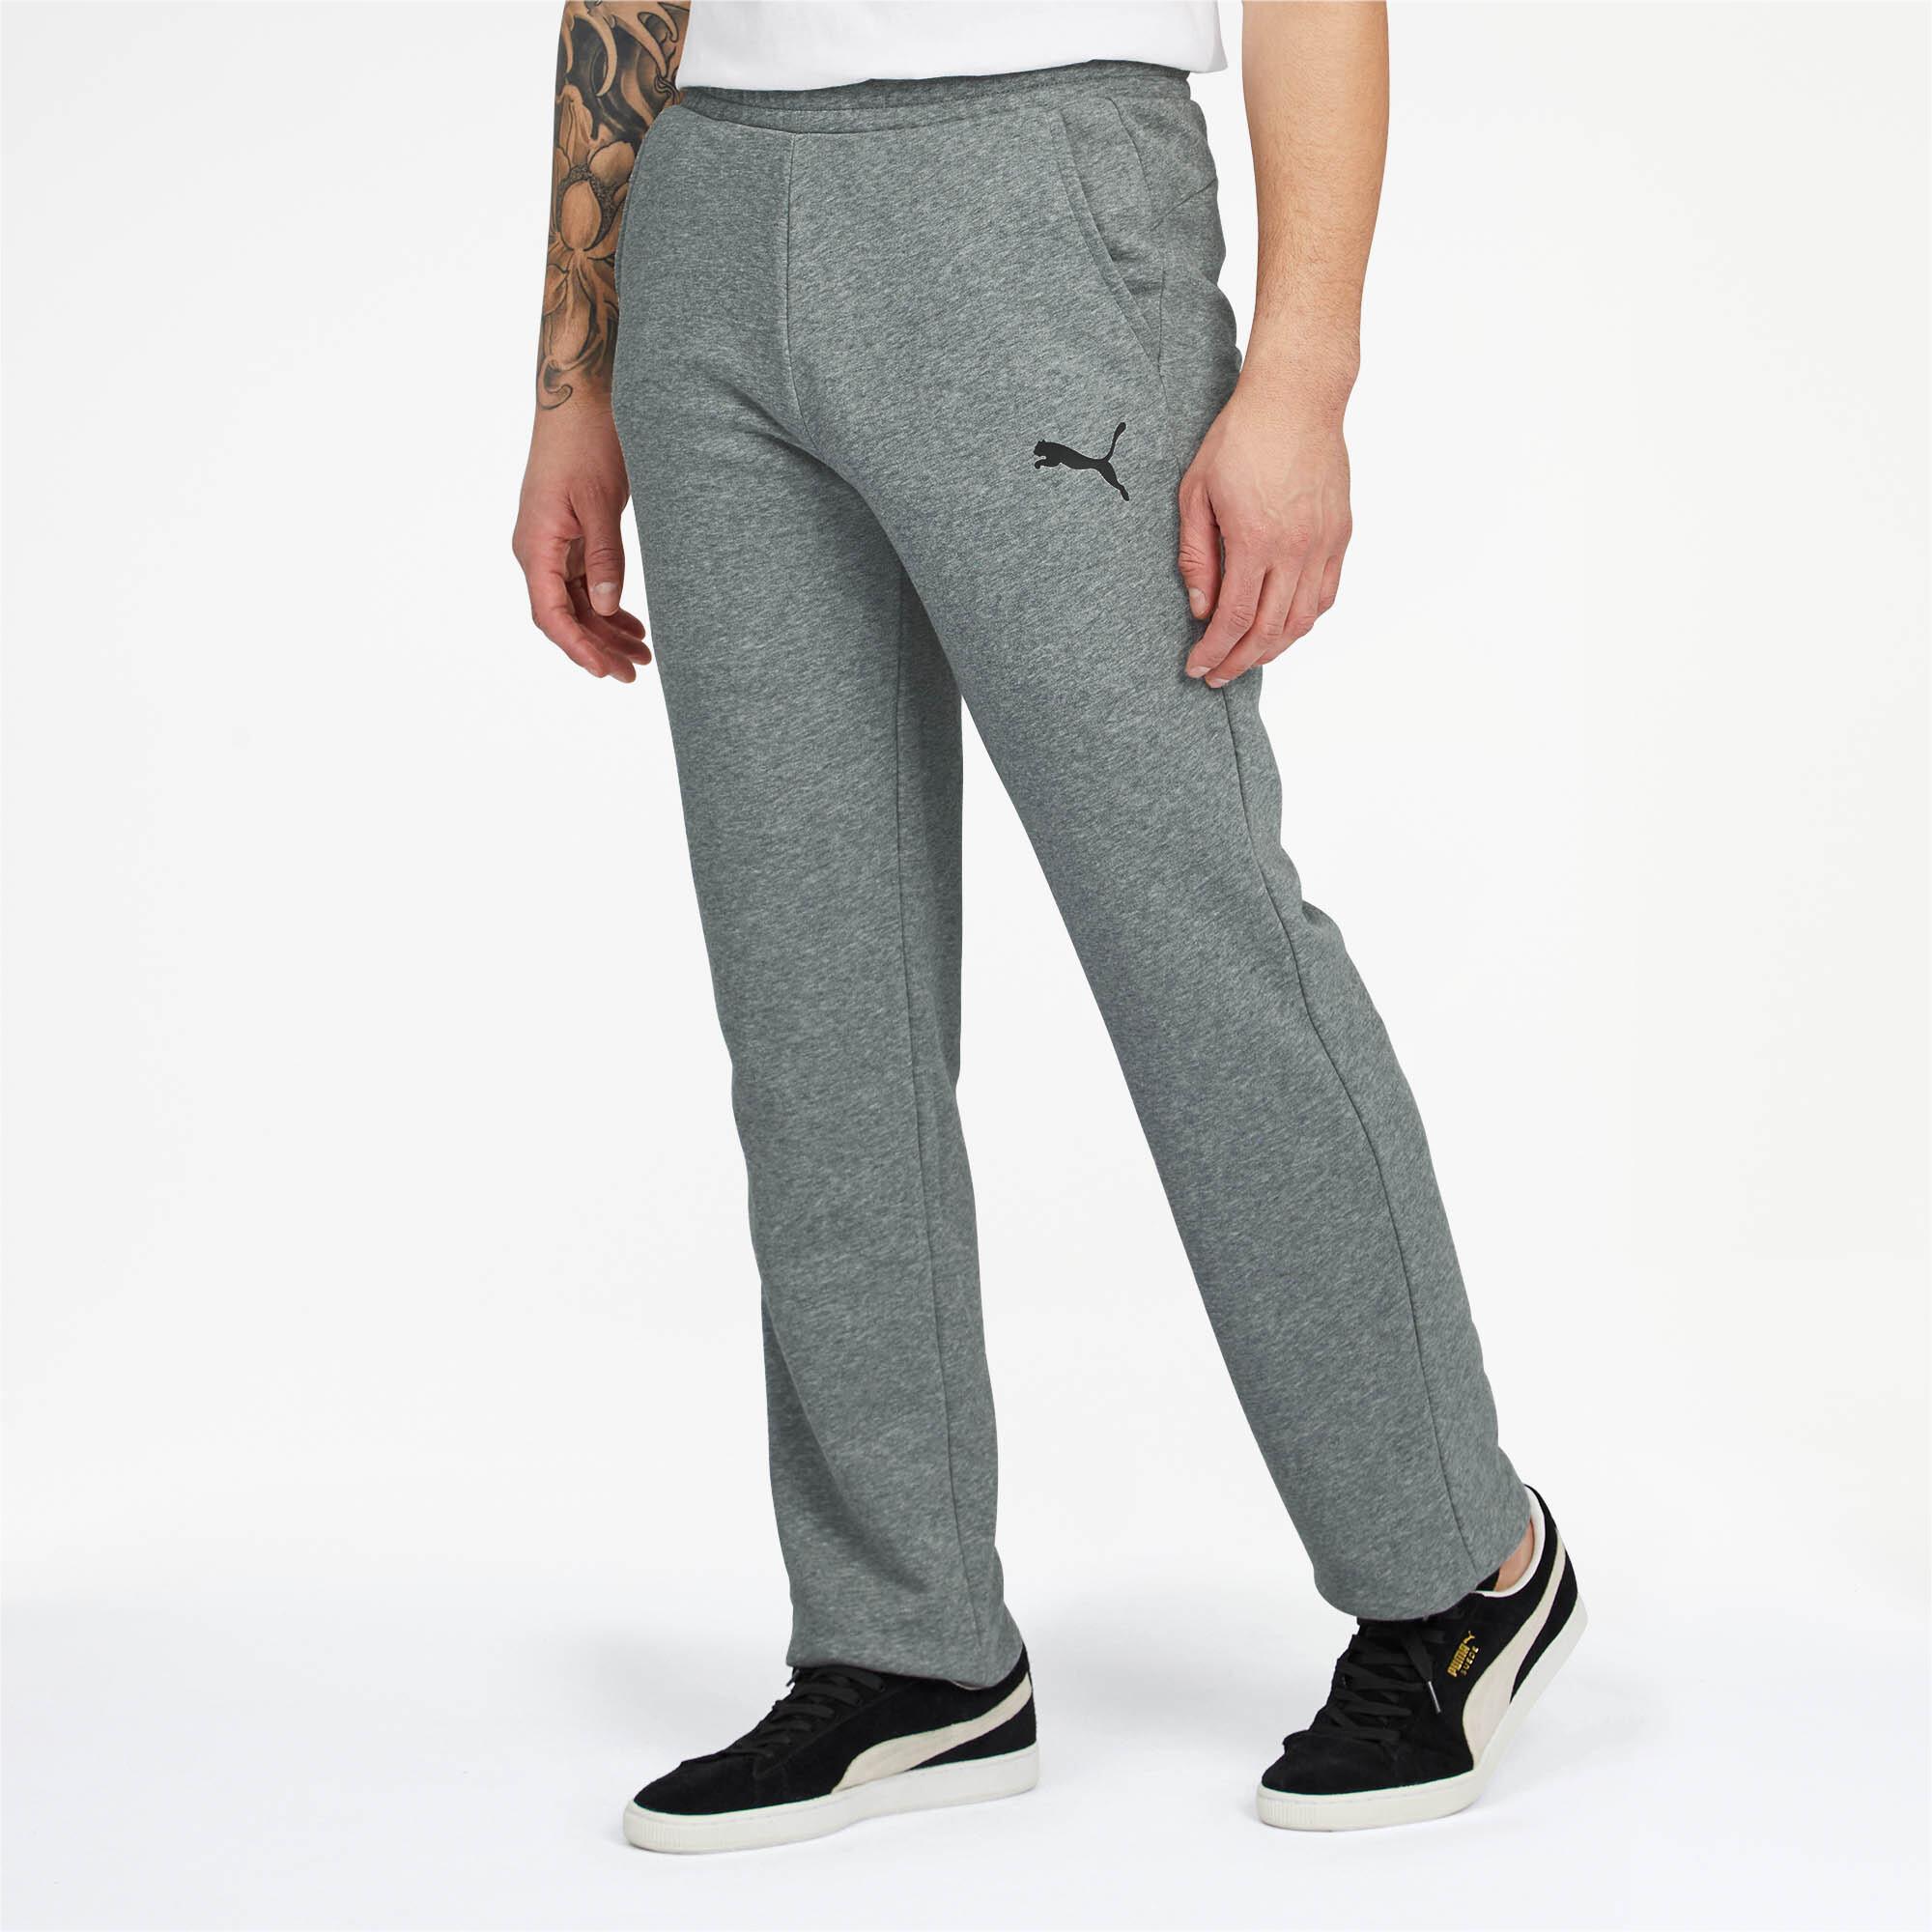 PUMA-Essentials-Men-039-s-Sweatpants-Men-Knitted-Pants-Basics thumbnail 9